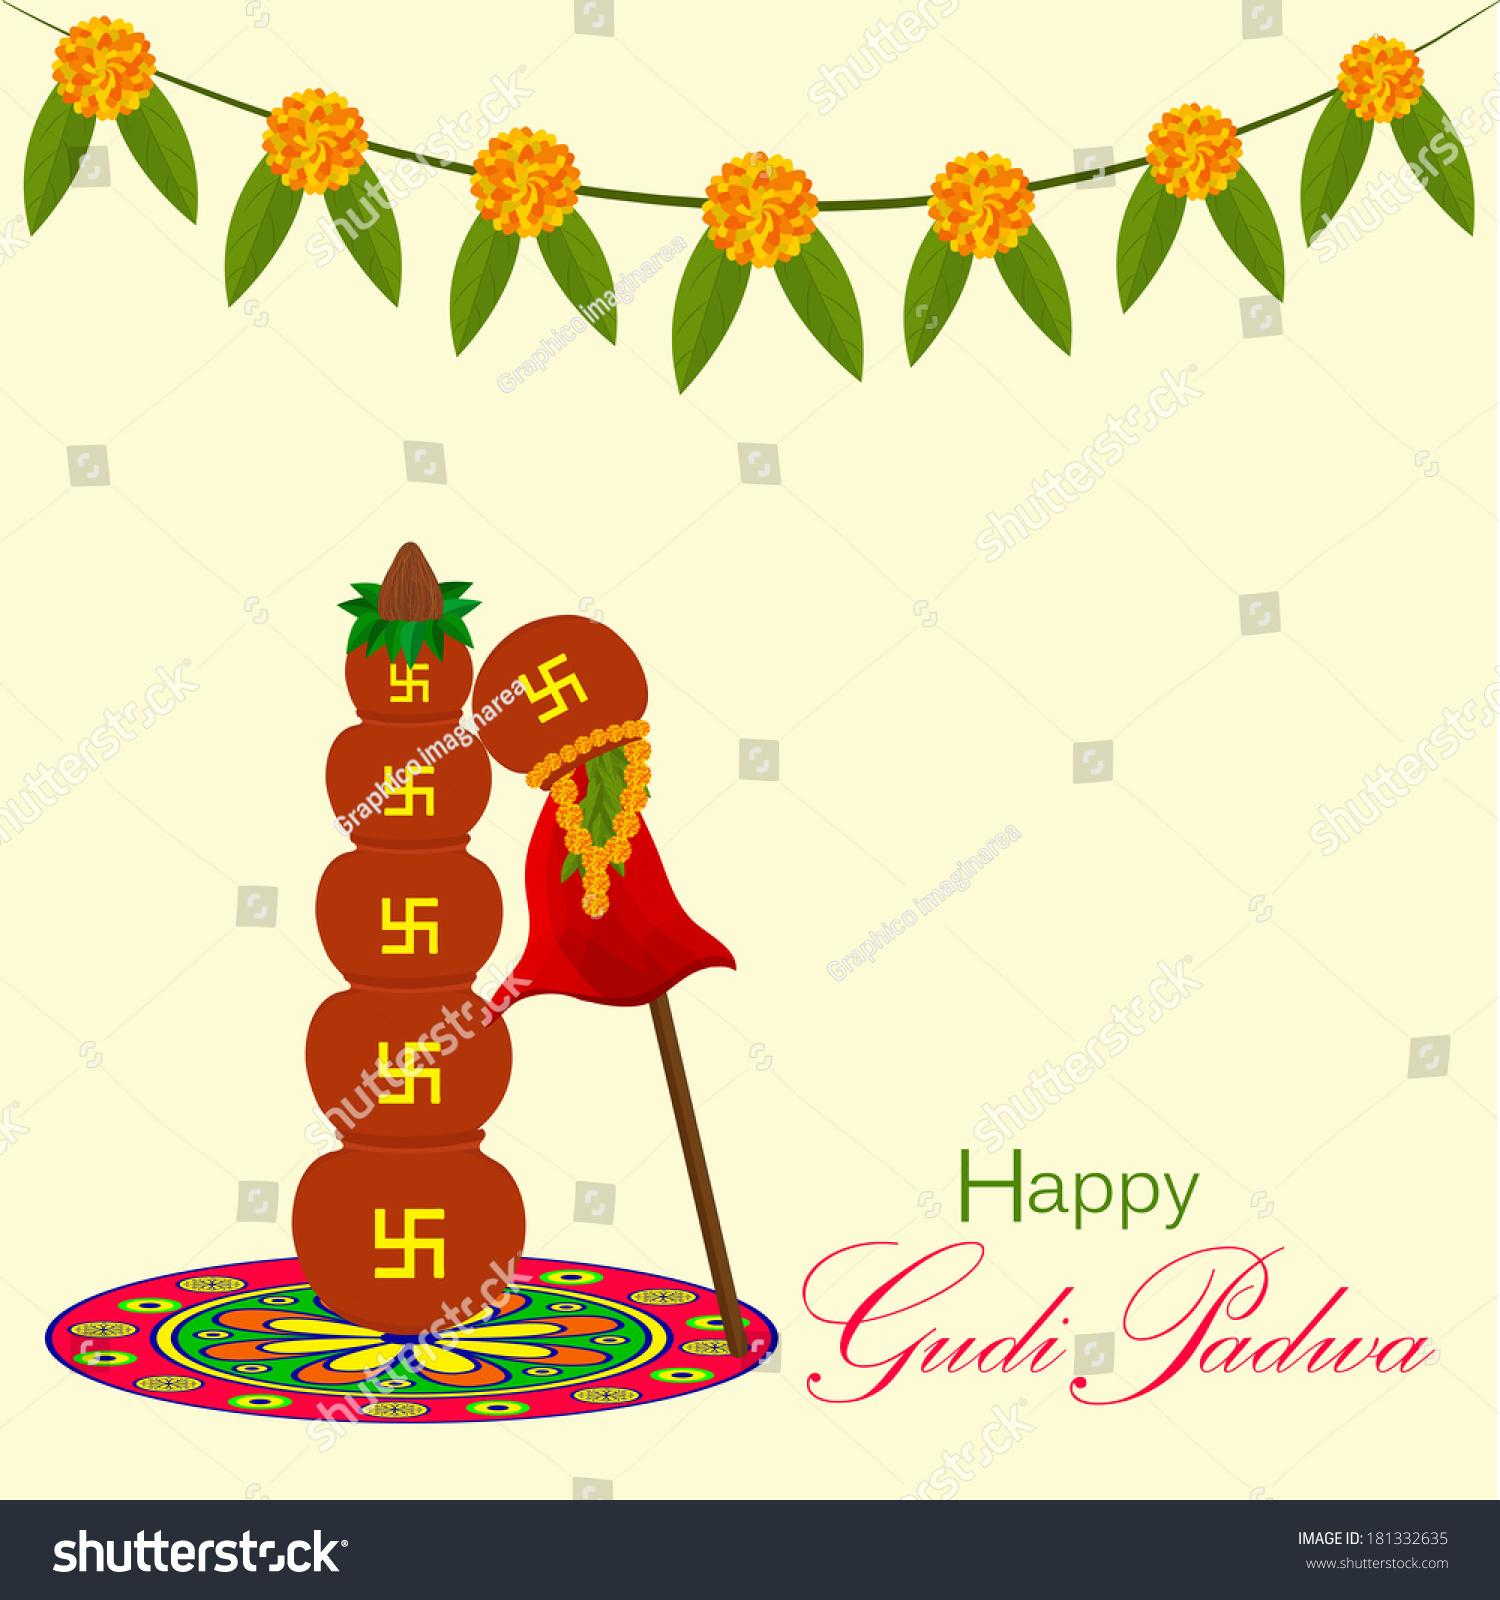 Gudi Padwa Indian Lunar New Years Stock Vector 181332635 Shutterstock